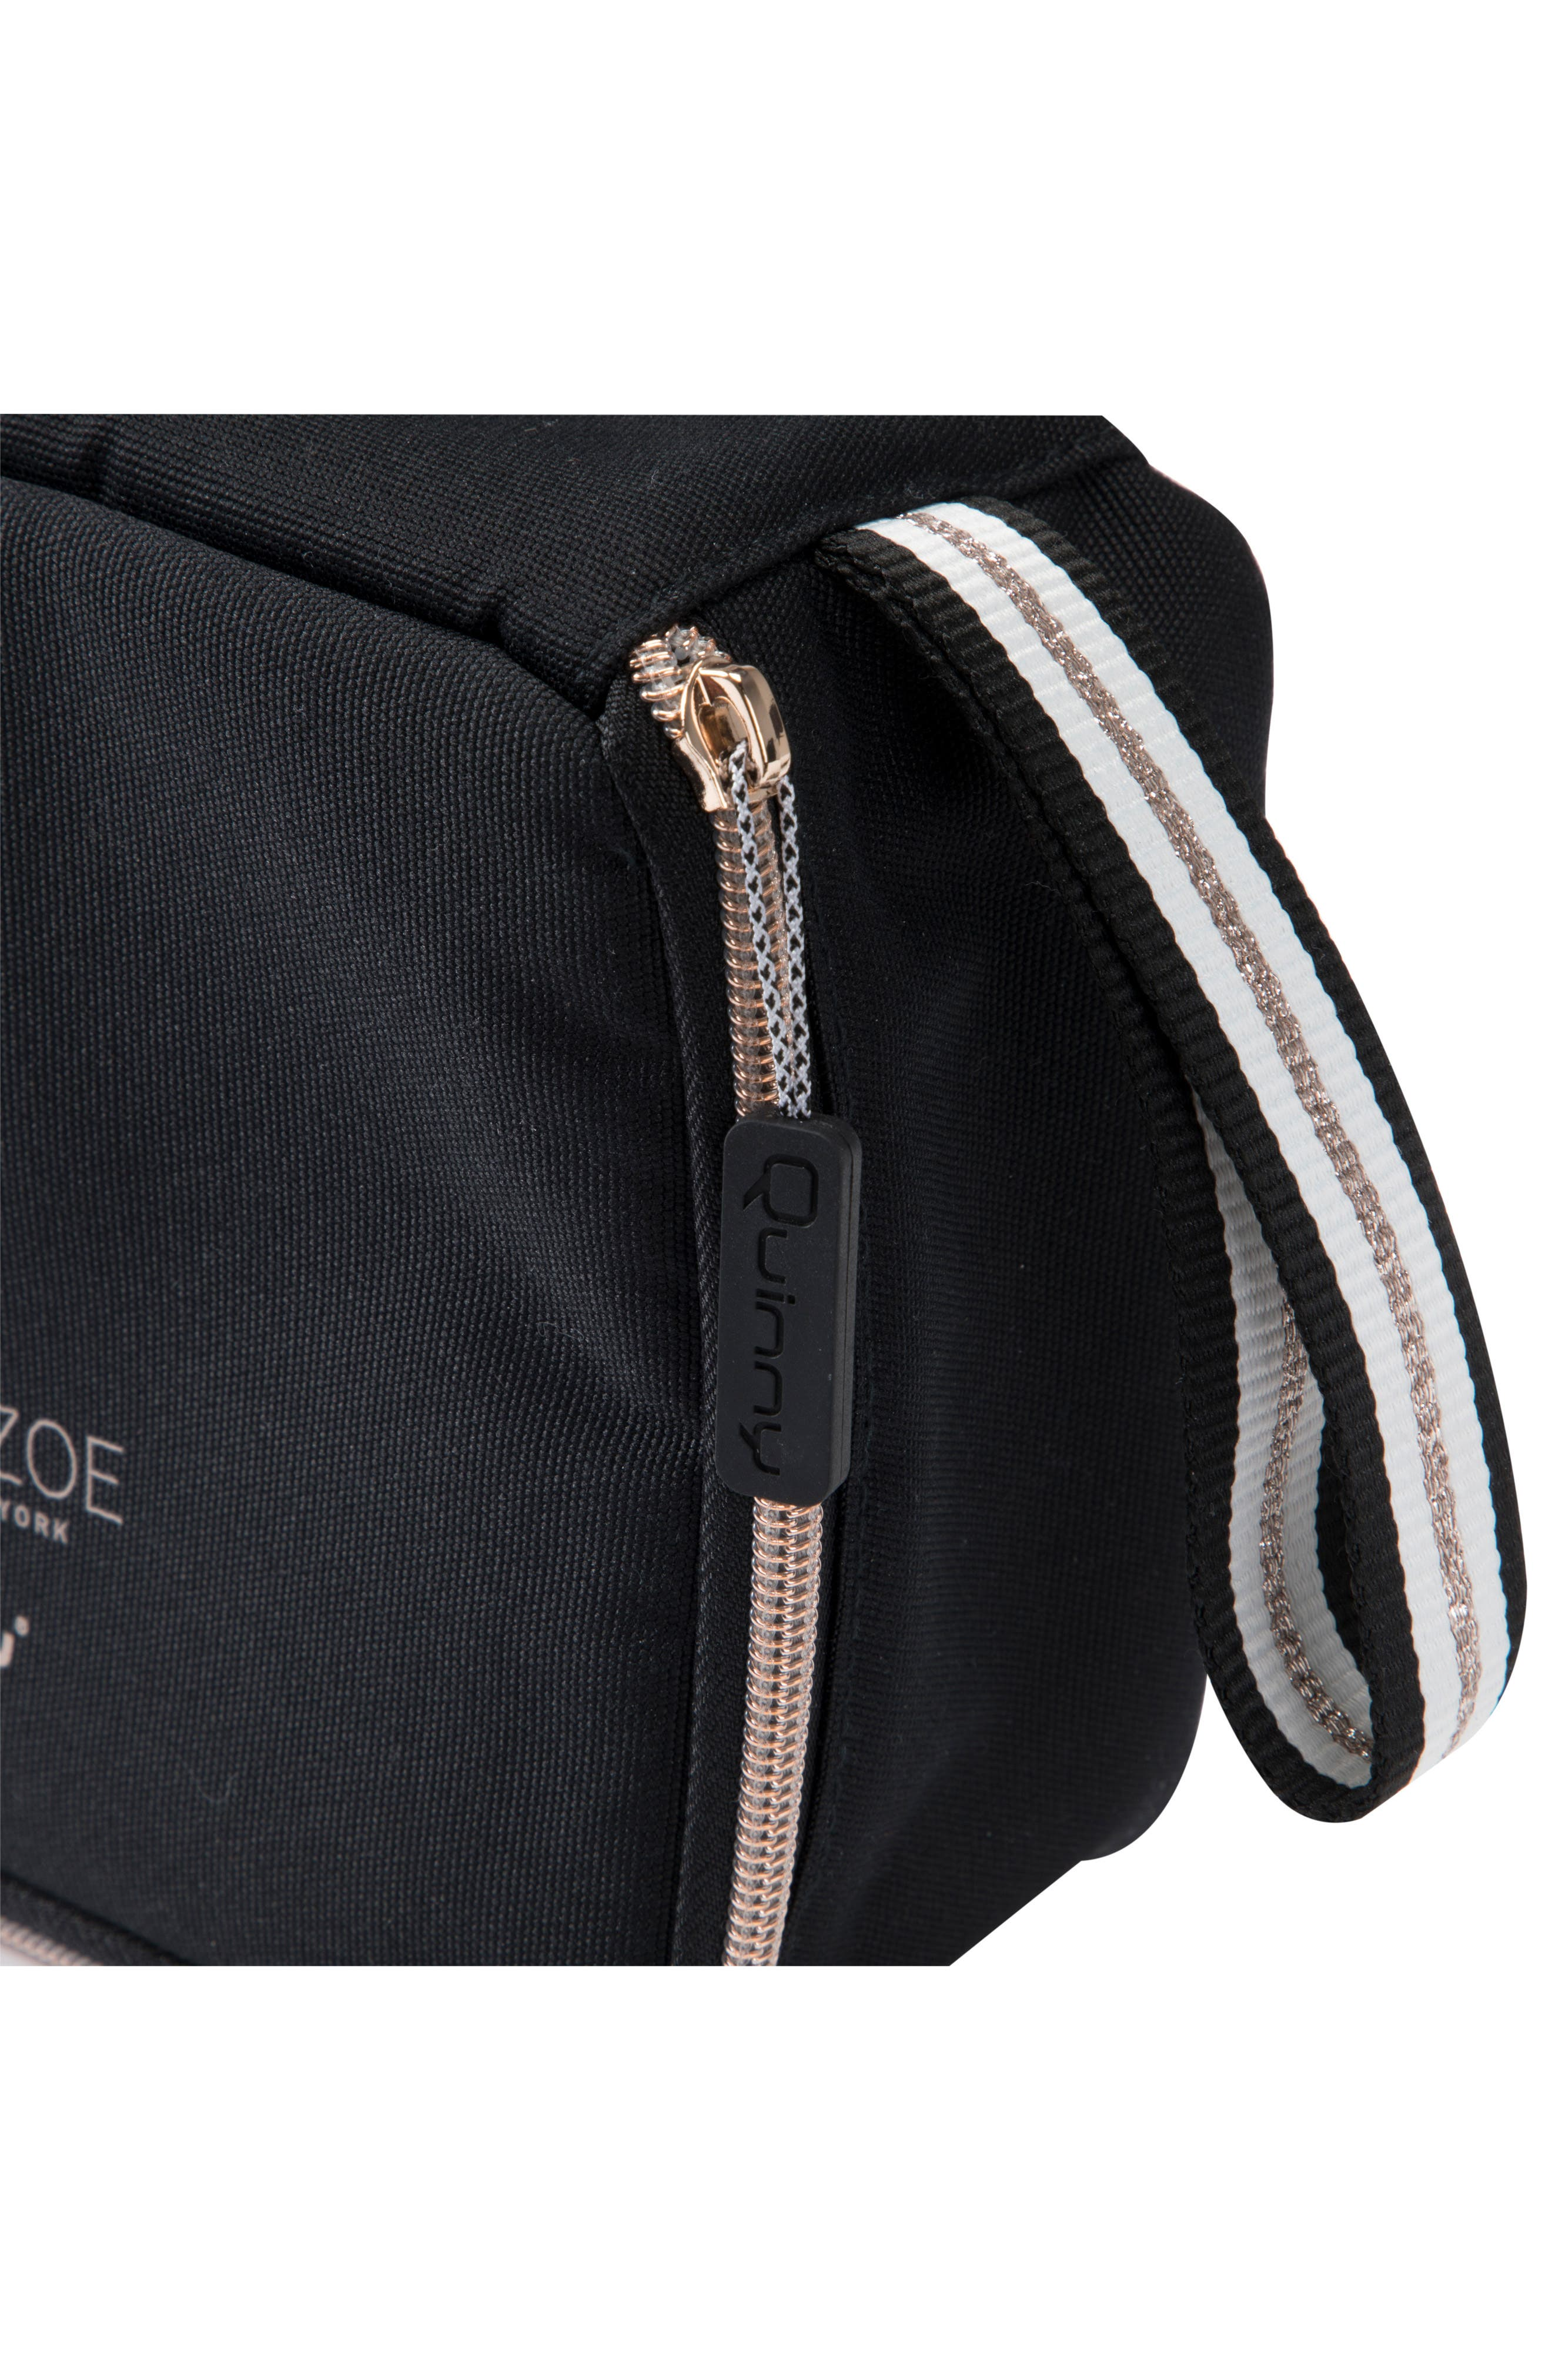 x Rachel Zoe Luxe Sport Diaper Bag,                             Alternate thumbnail 12, color,                             Rz Luxe Sport